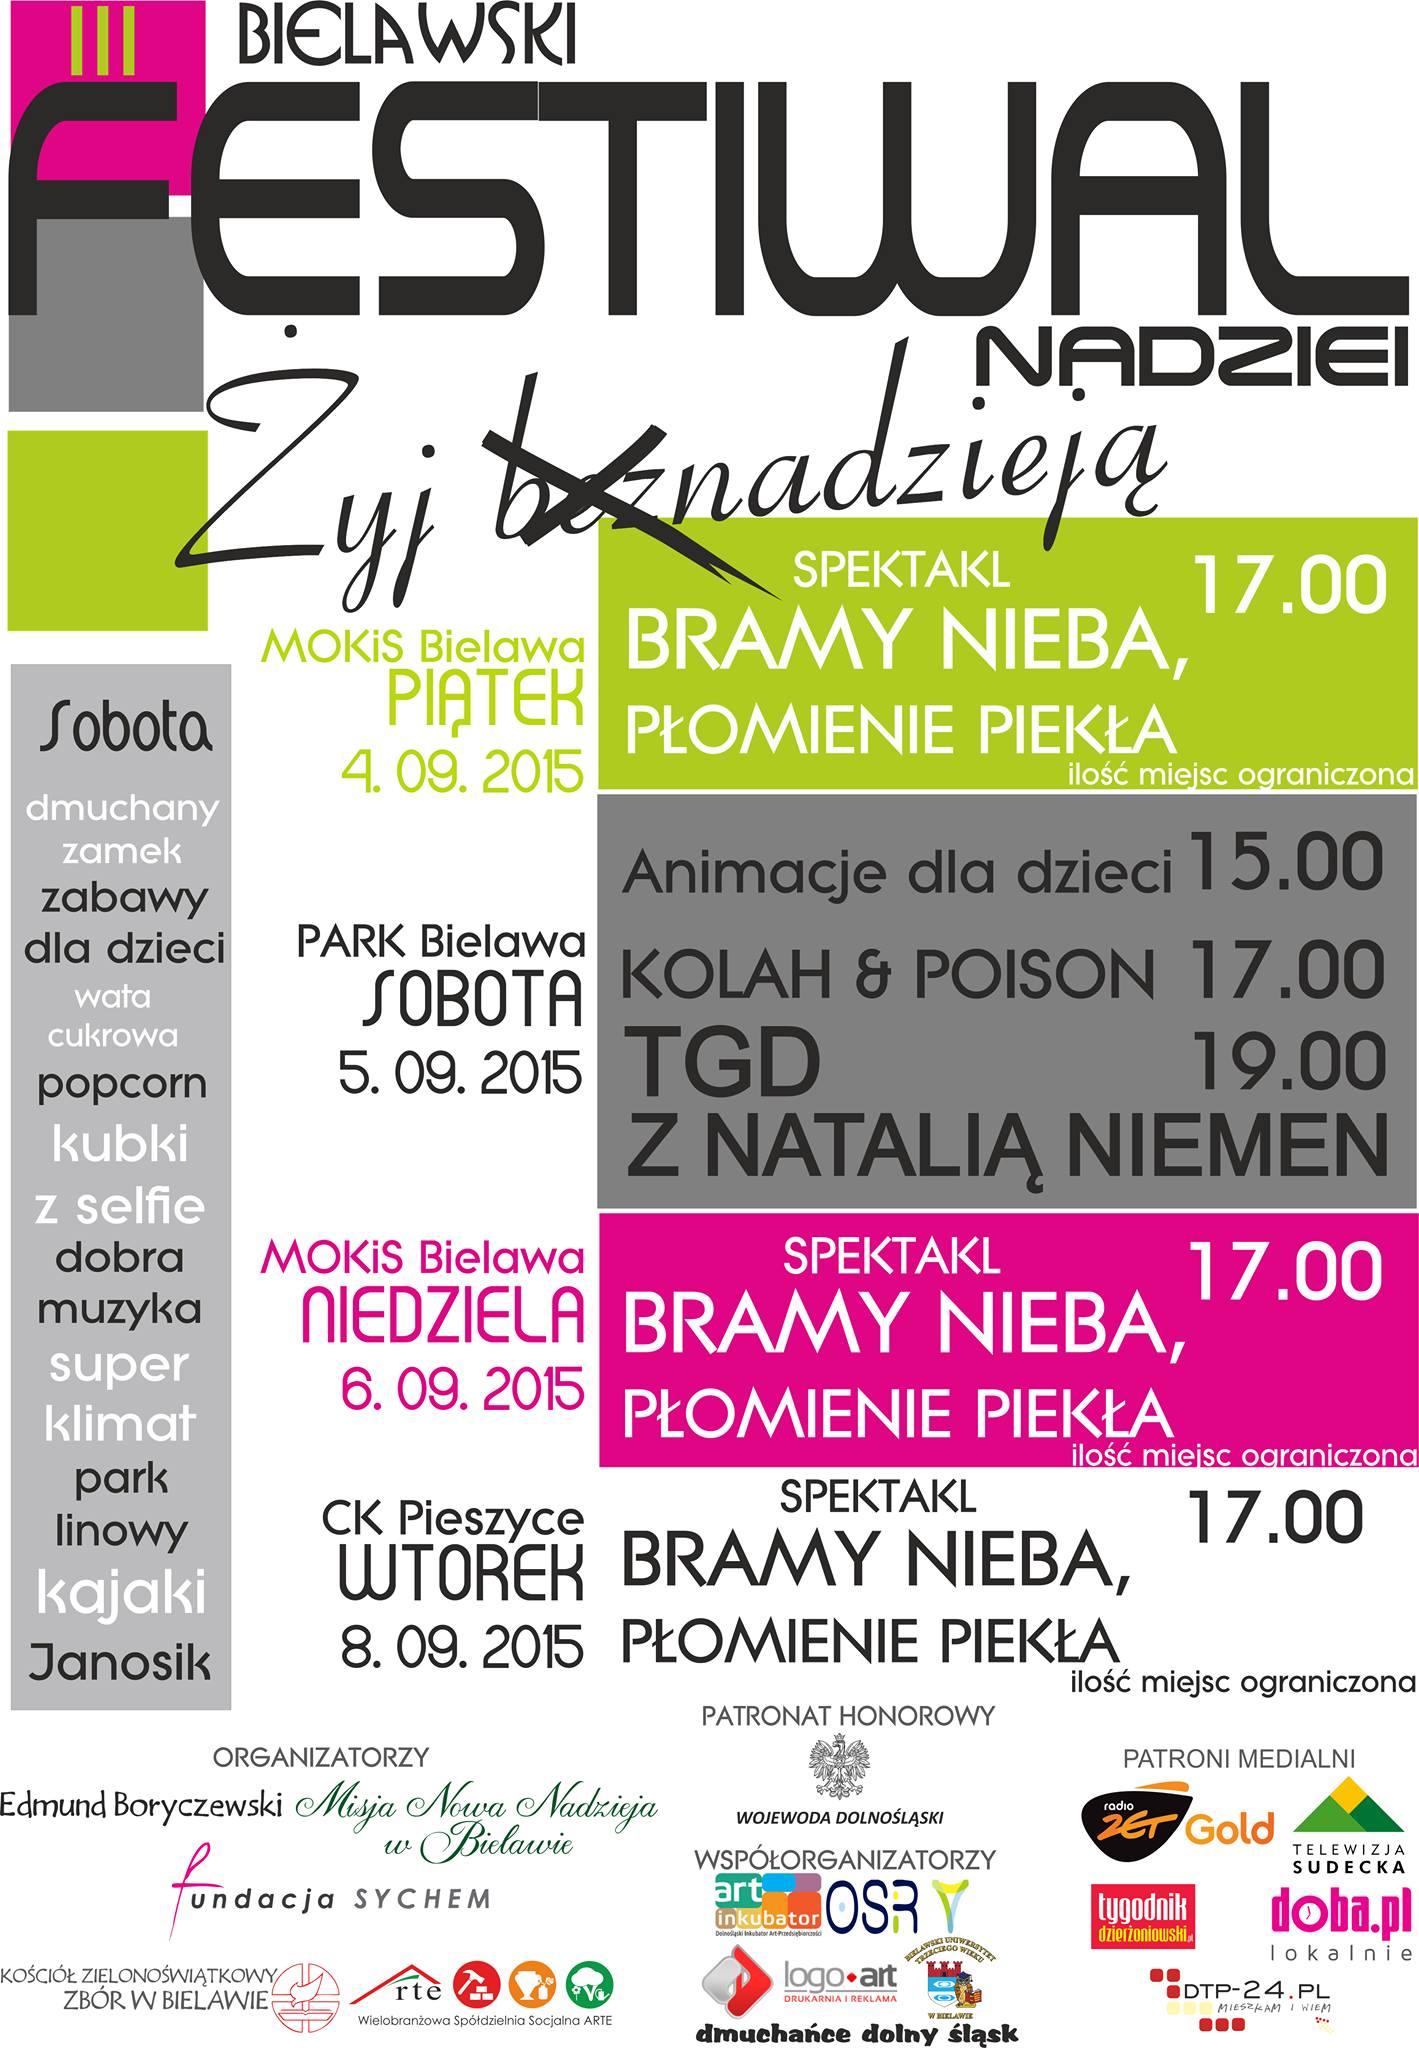 III Bielawski Festiwal Nadziei